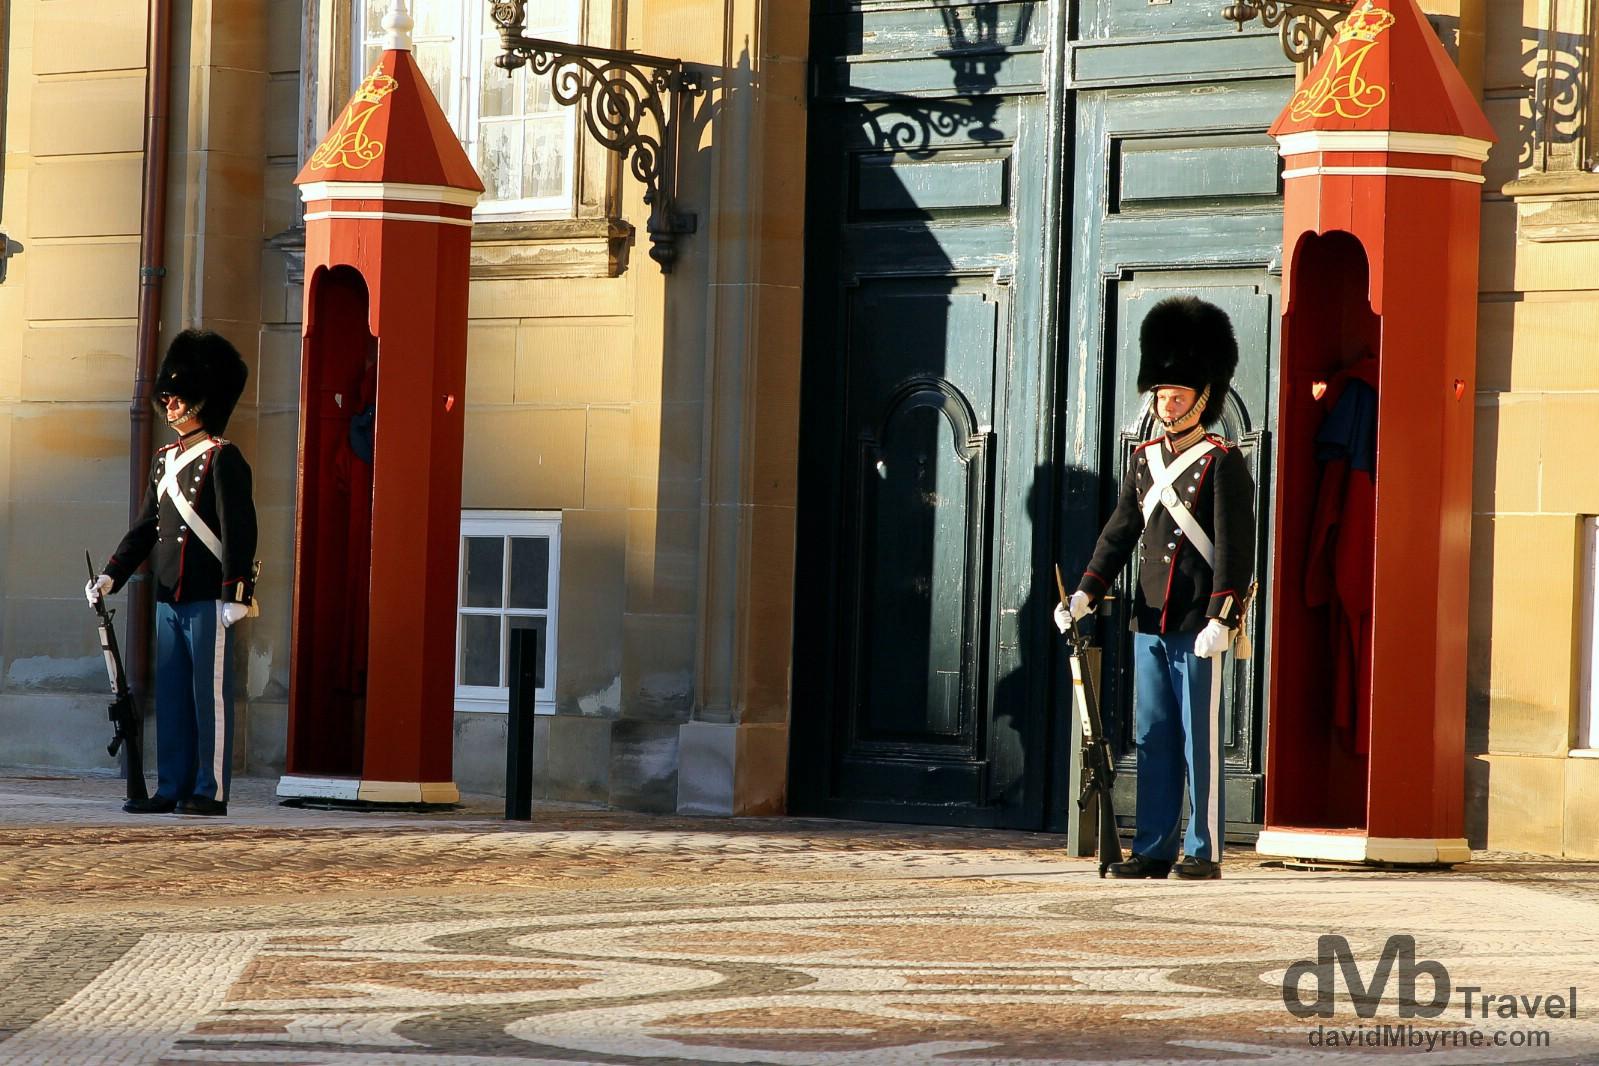 Guards outside Amalienborg, the winter residence of the Danish Royal family, in Copenhagen, Denmark. March 12th, 2014.